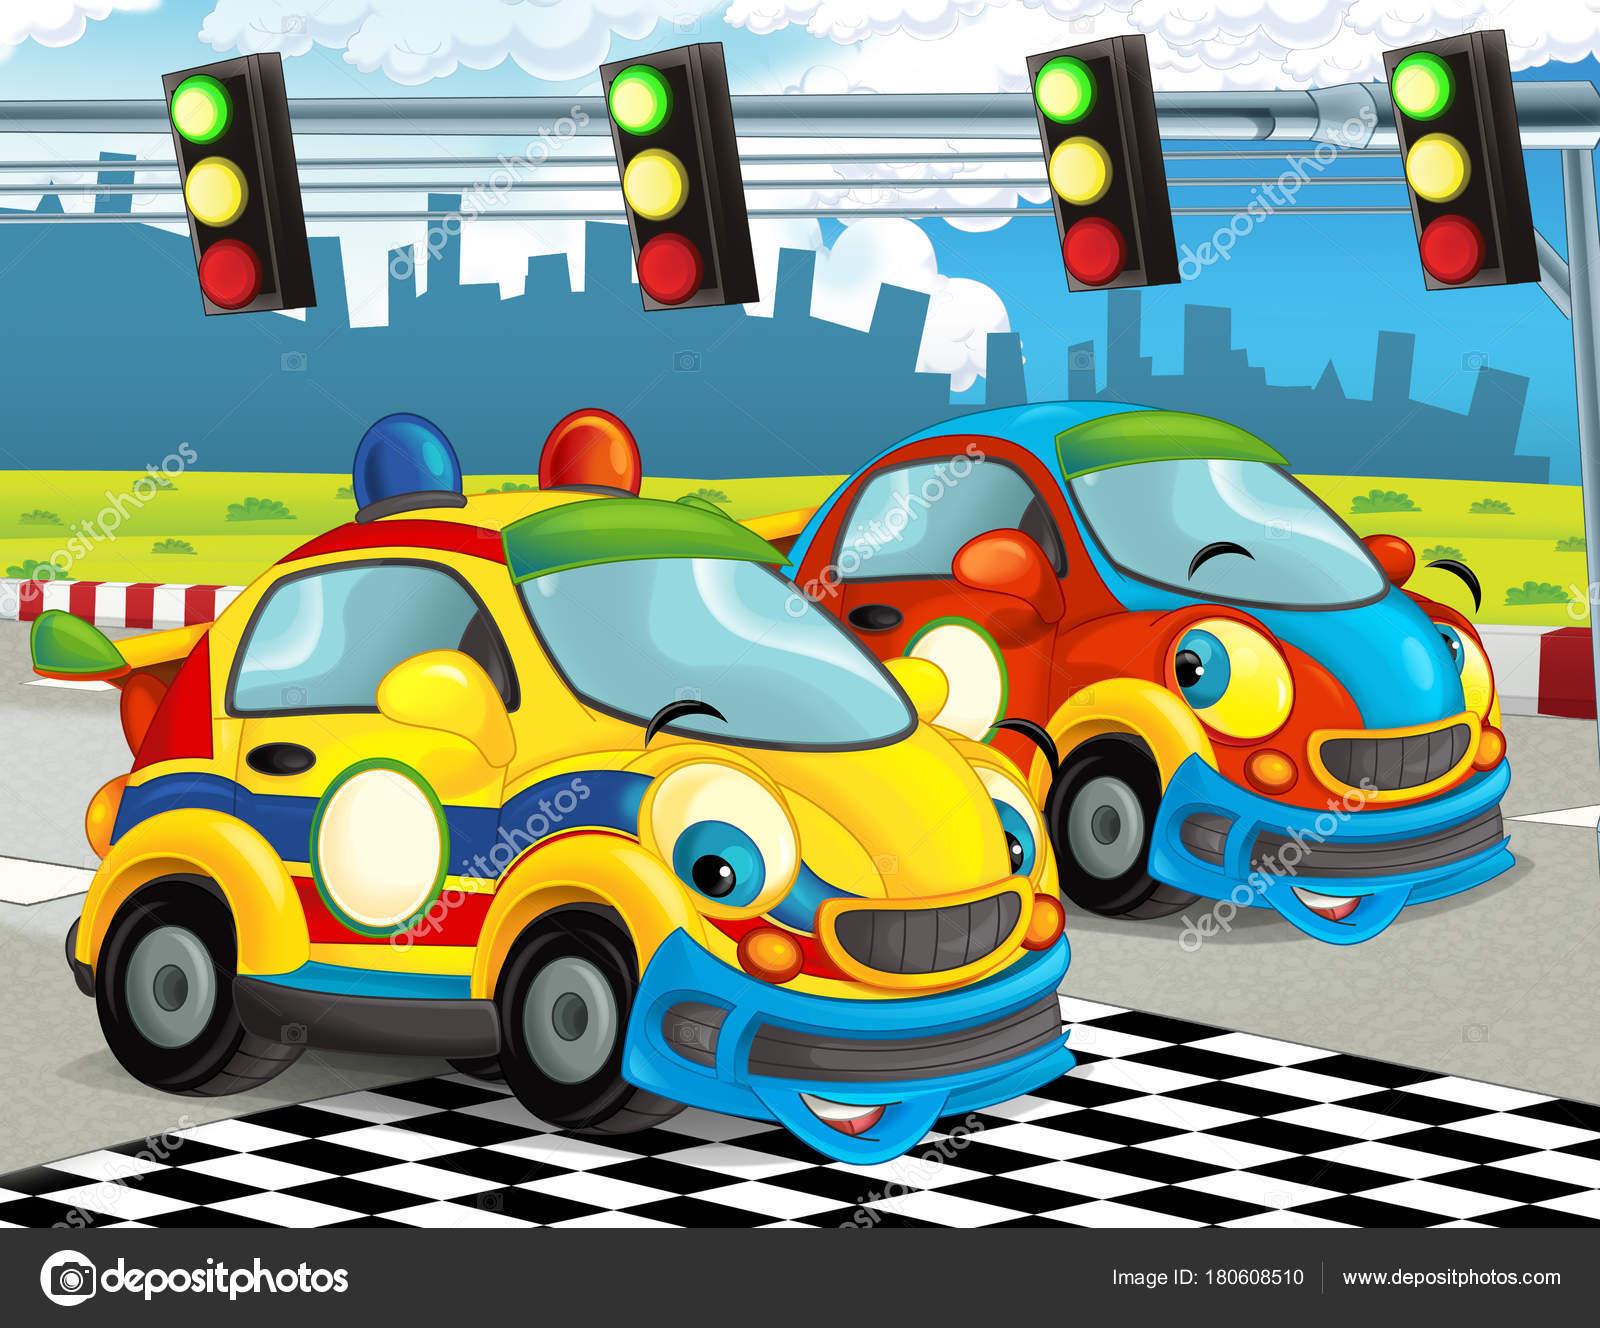 Cartoon Funny Happy Looking Racing Cars Race Track Illustration